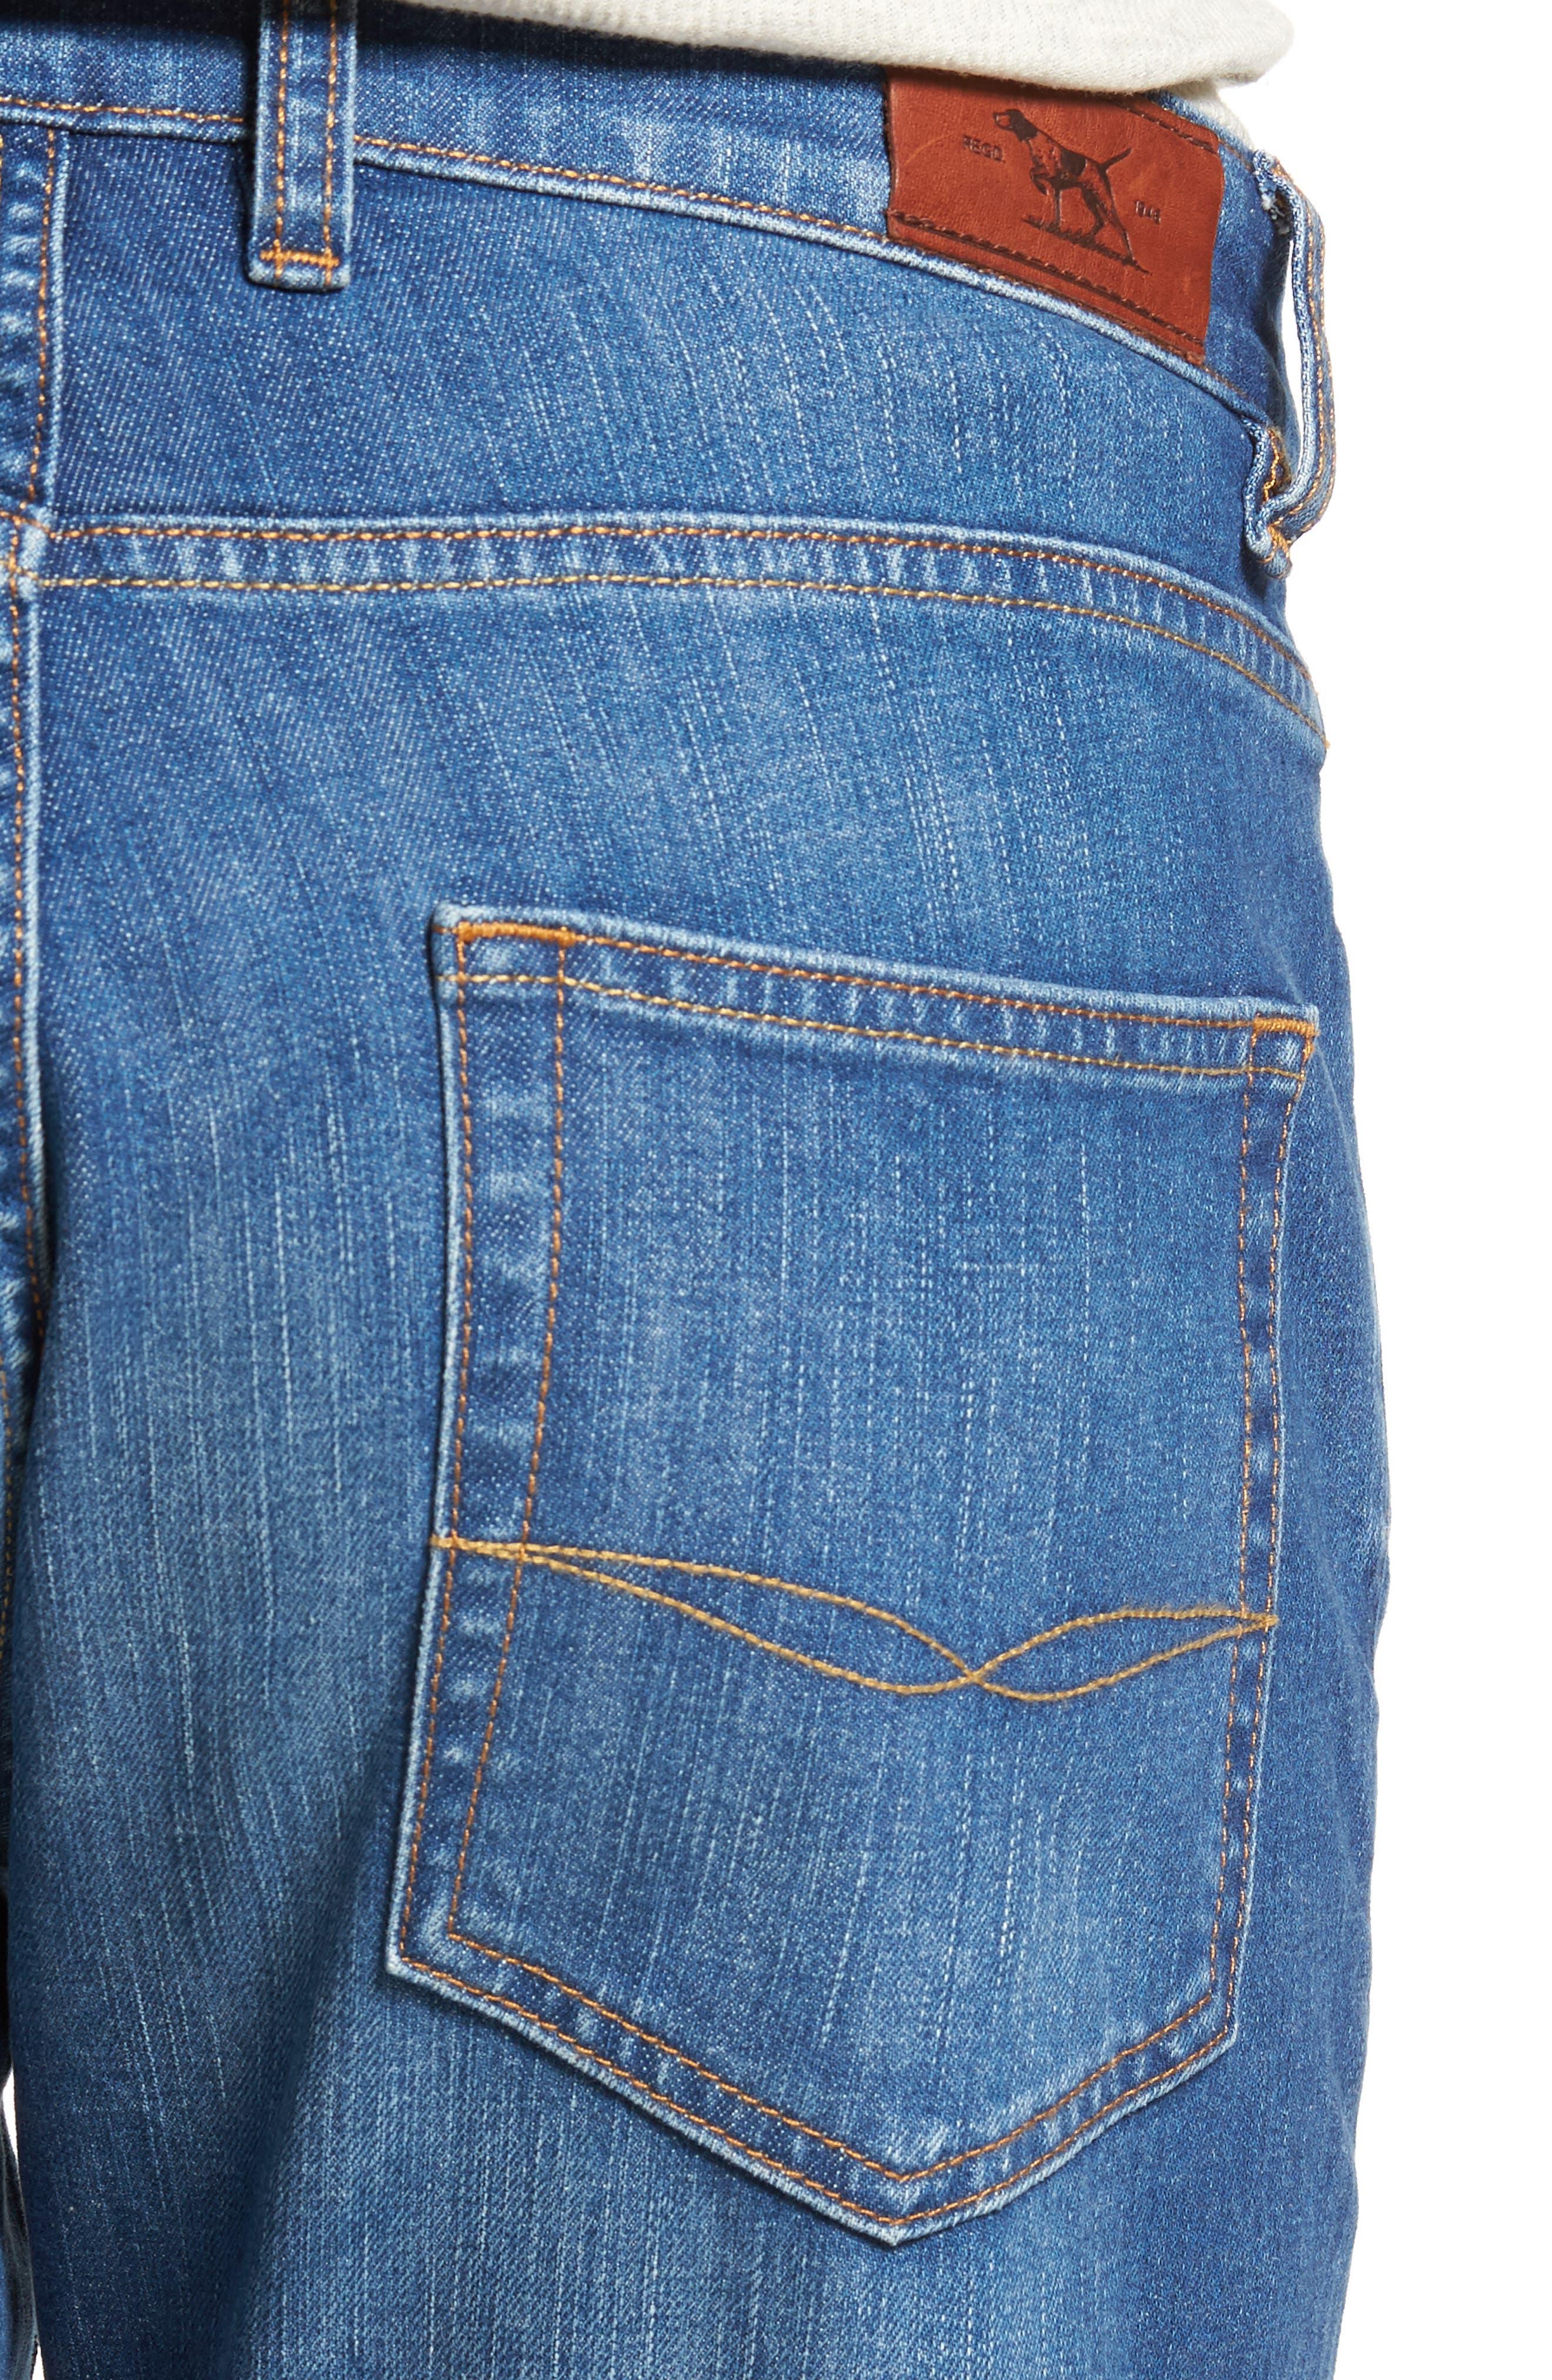 Cranfield Straight Leg Jeans,                             Alternate thumbnail 4, color,                             420